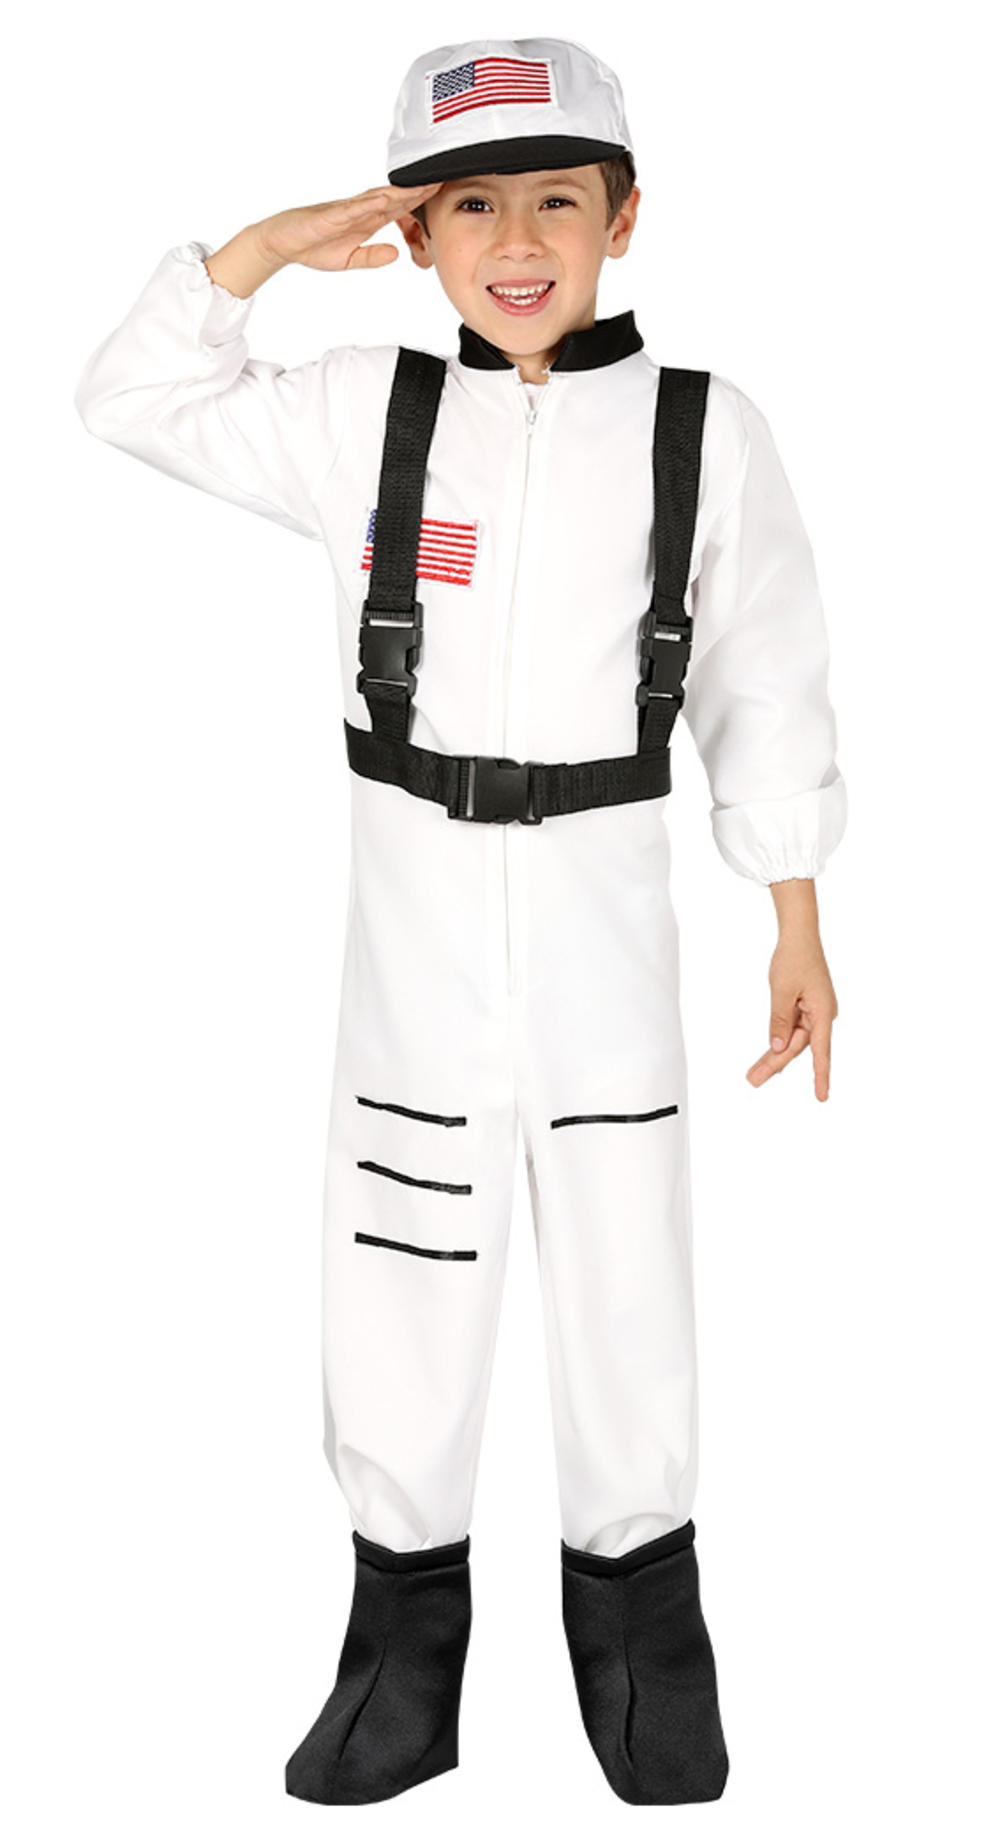 Childrens Astronaut Costume